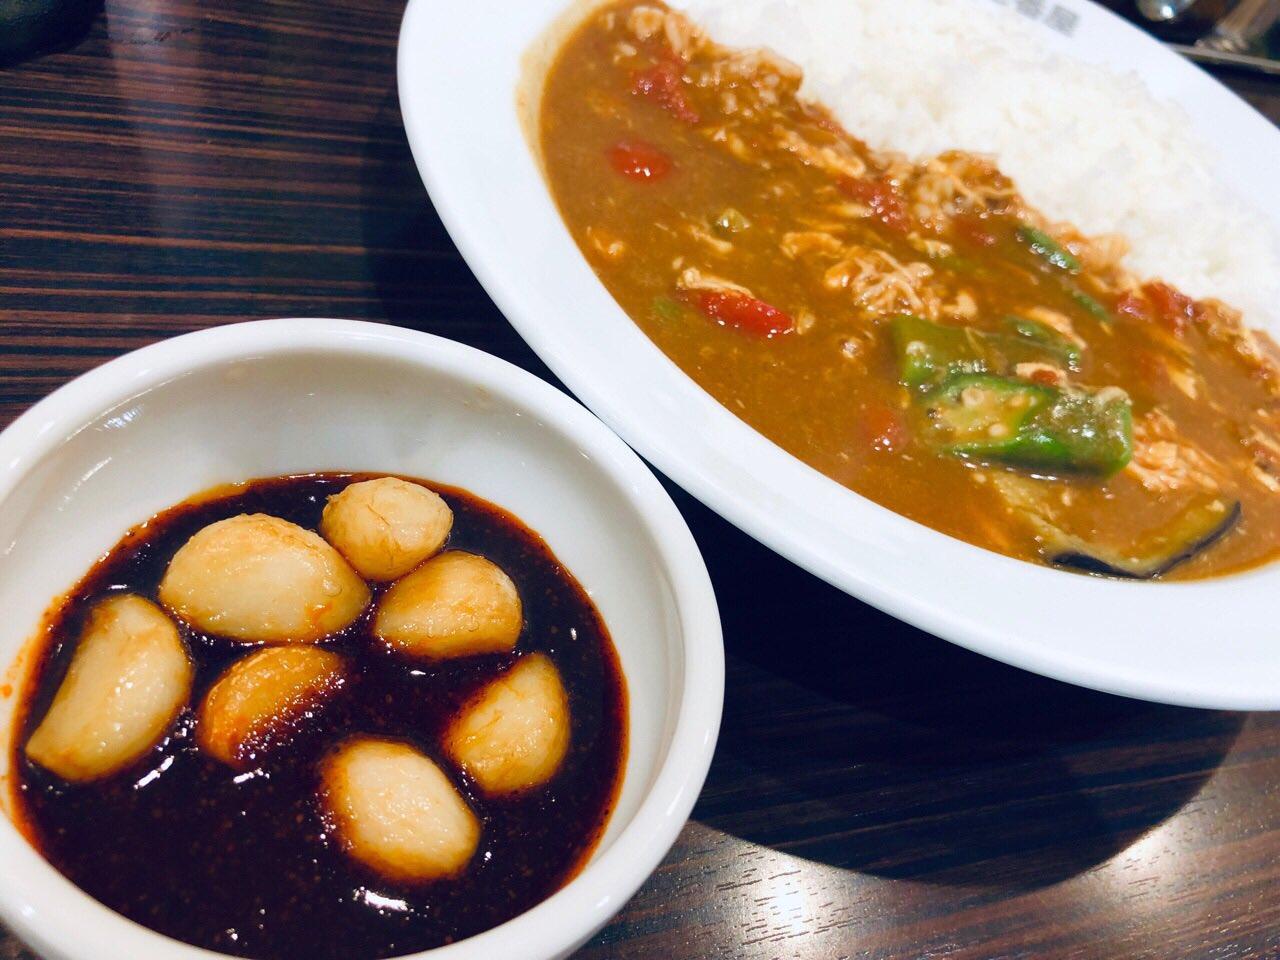 CoCo壱番屋 チキンと夏野菜カレー 旨辛にんにくトッピング (゚д゚)ウマー https://t.co/5V1L7XbOEp